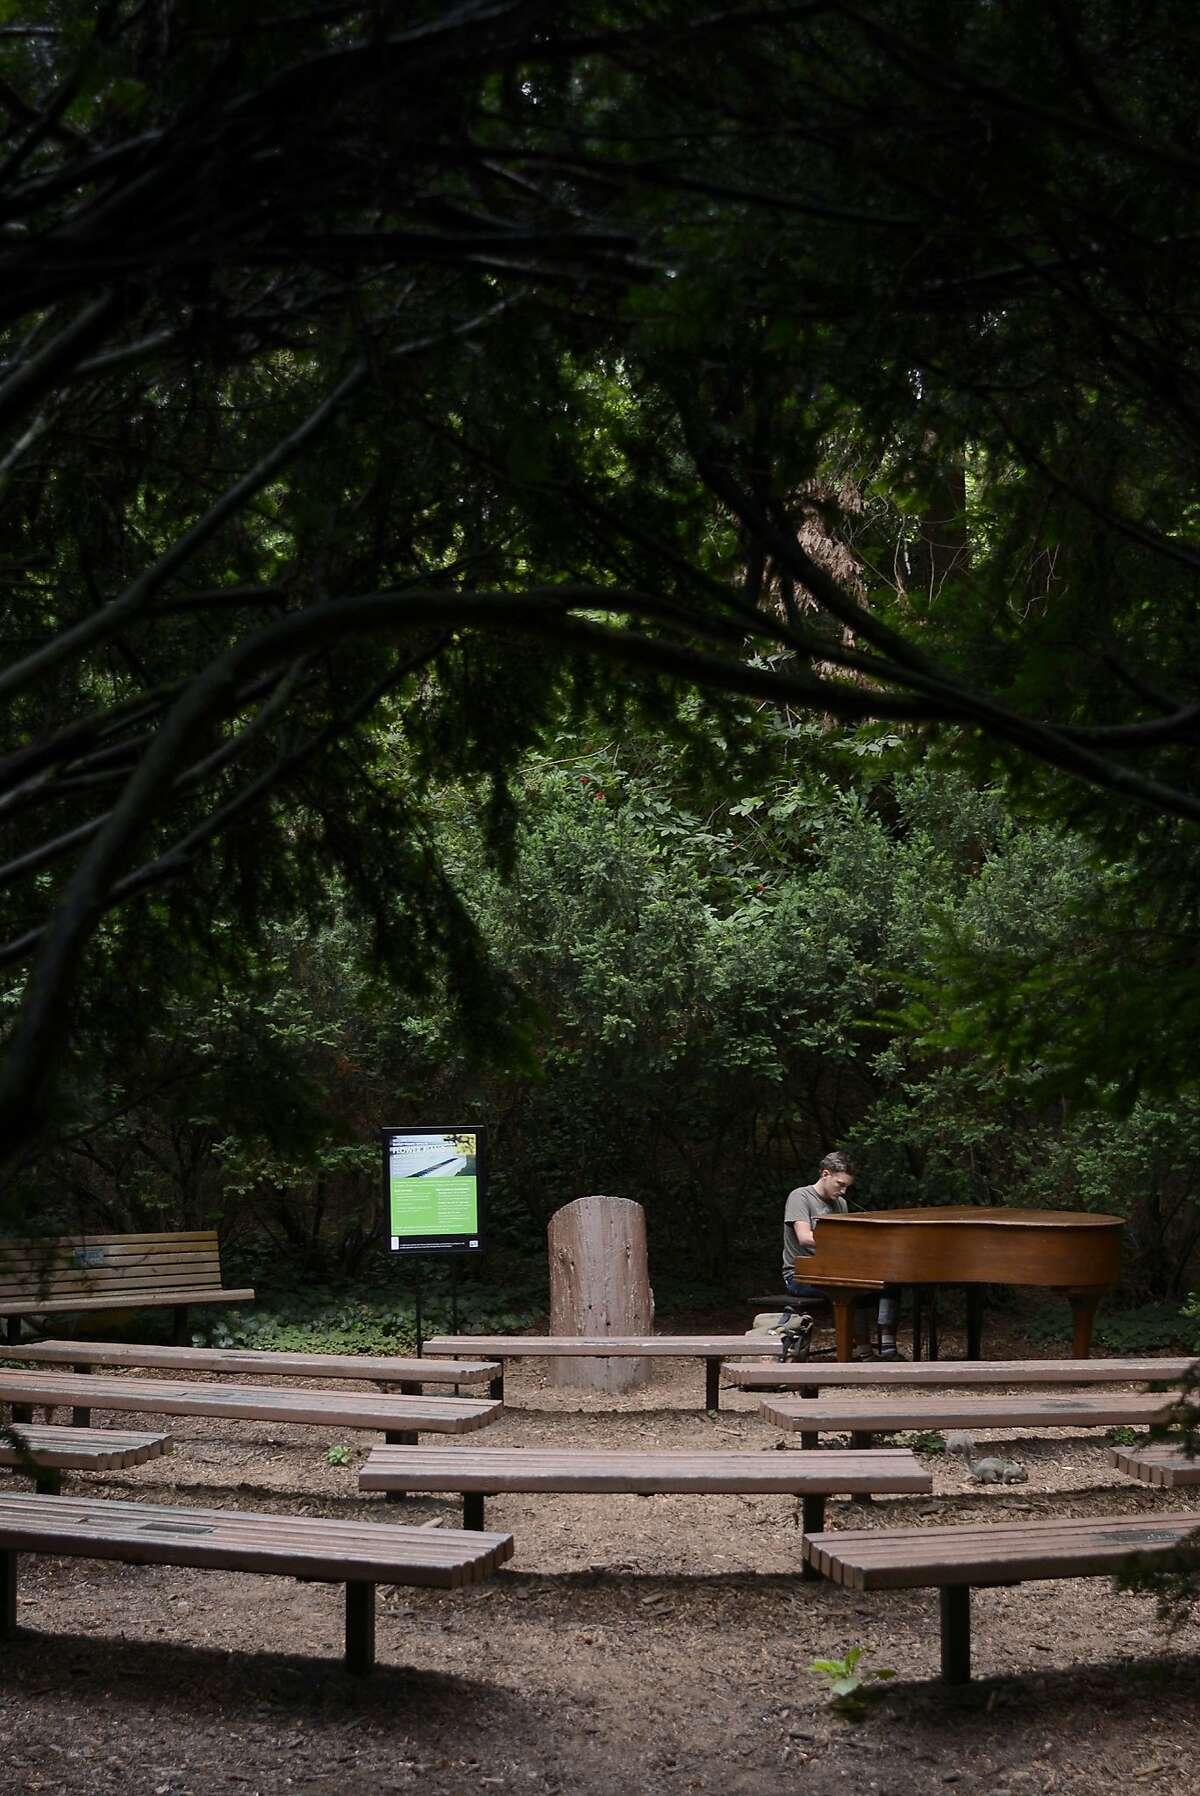 Reese Kolar plays one of the seven pianos at the San Francisco Botanical Gardens in San Francisco, California, on Thursday, July 9, 2015.